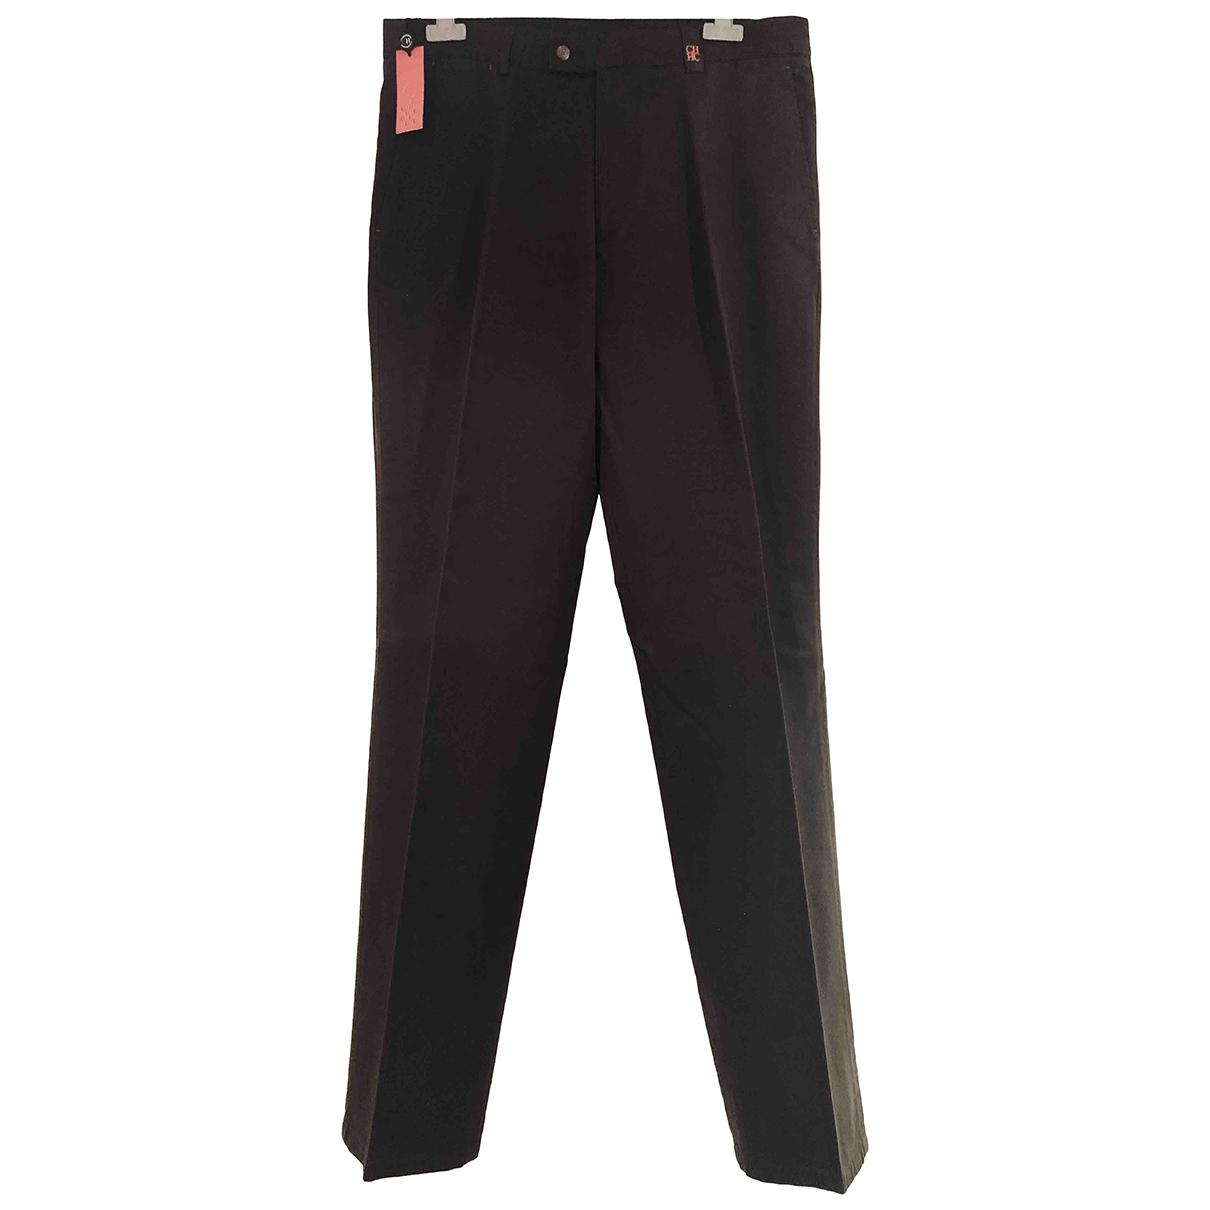 Carolina Herrera - Pantalon   pour homme en coton - marron